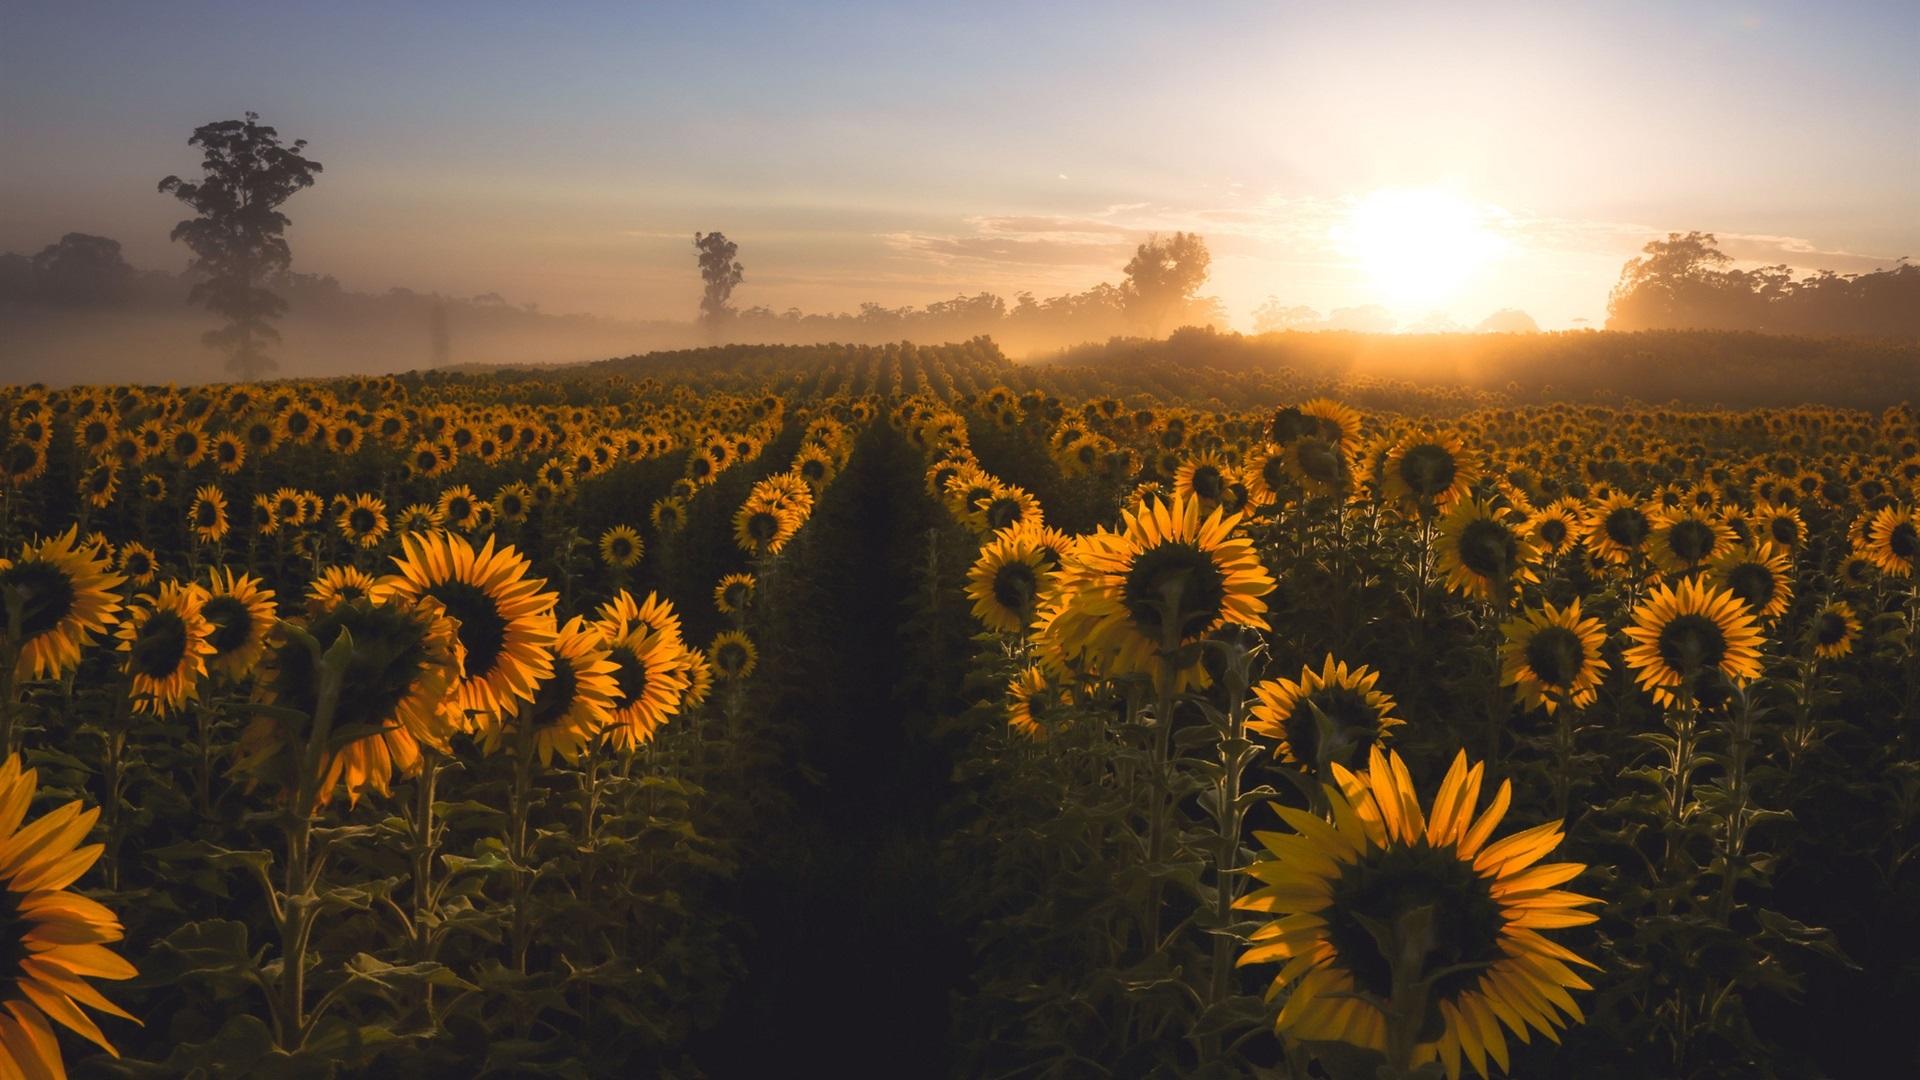 download wallpaper 1920x1080 sunflowers morning fog